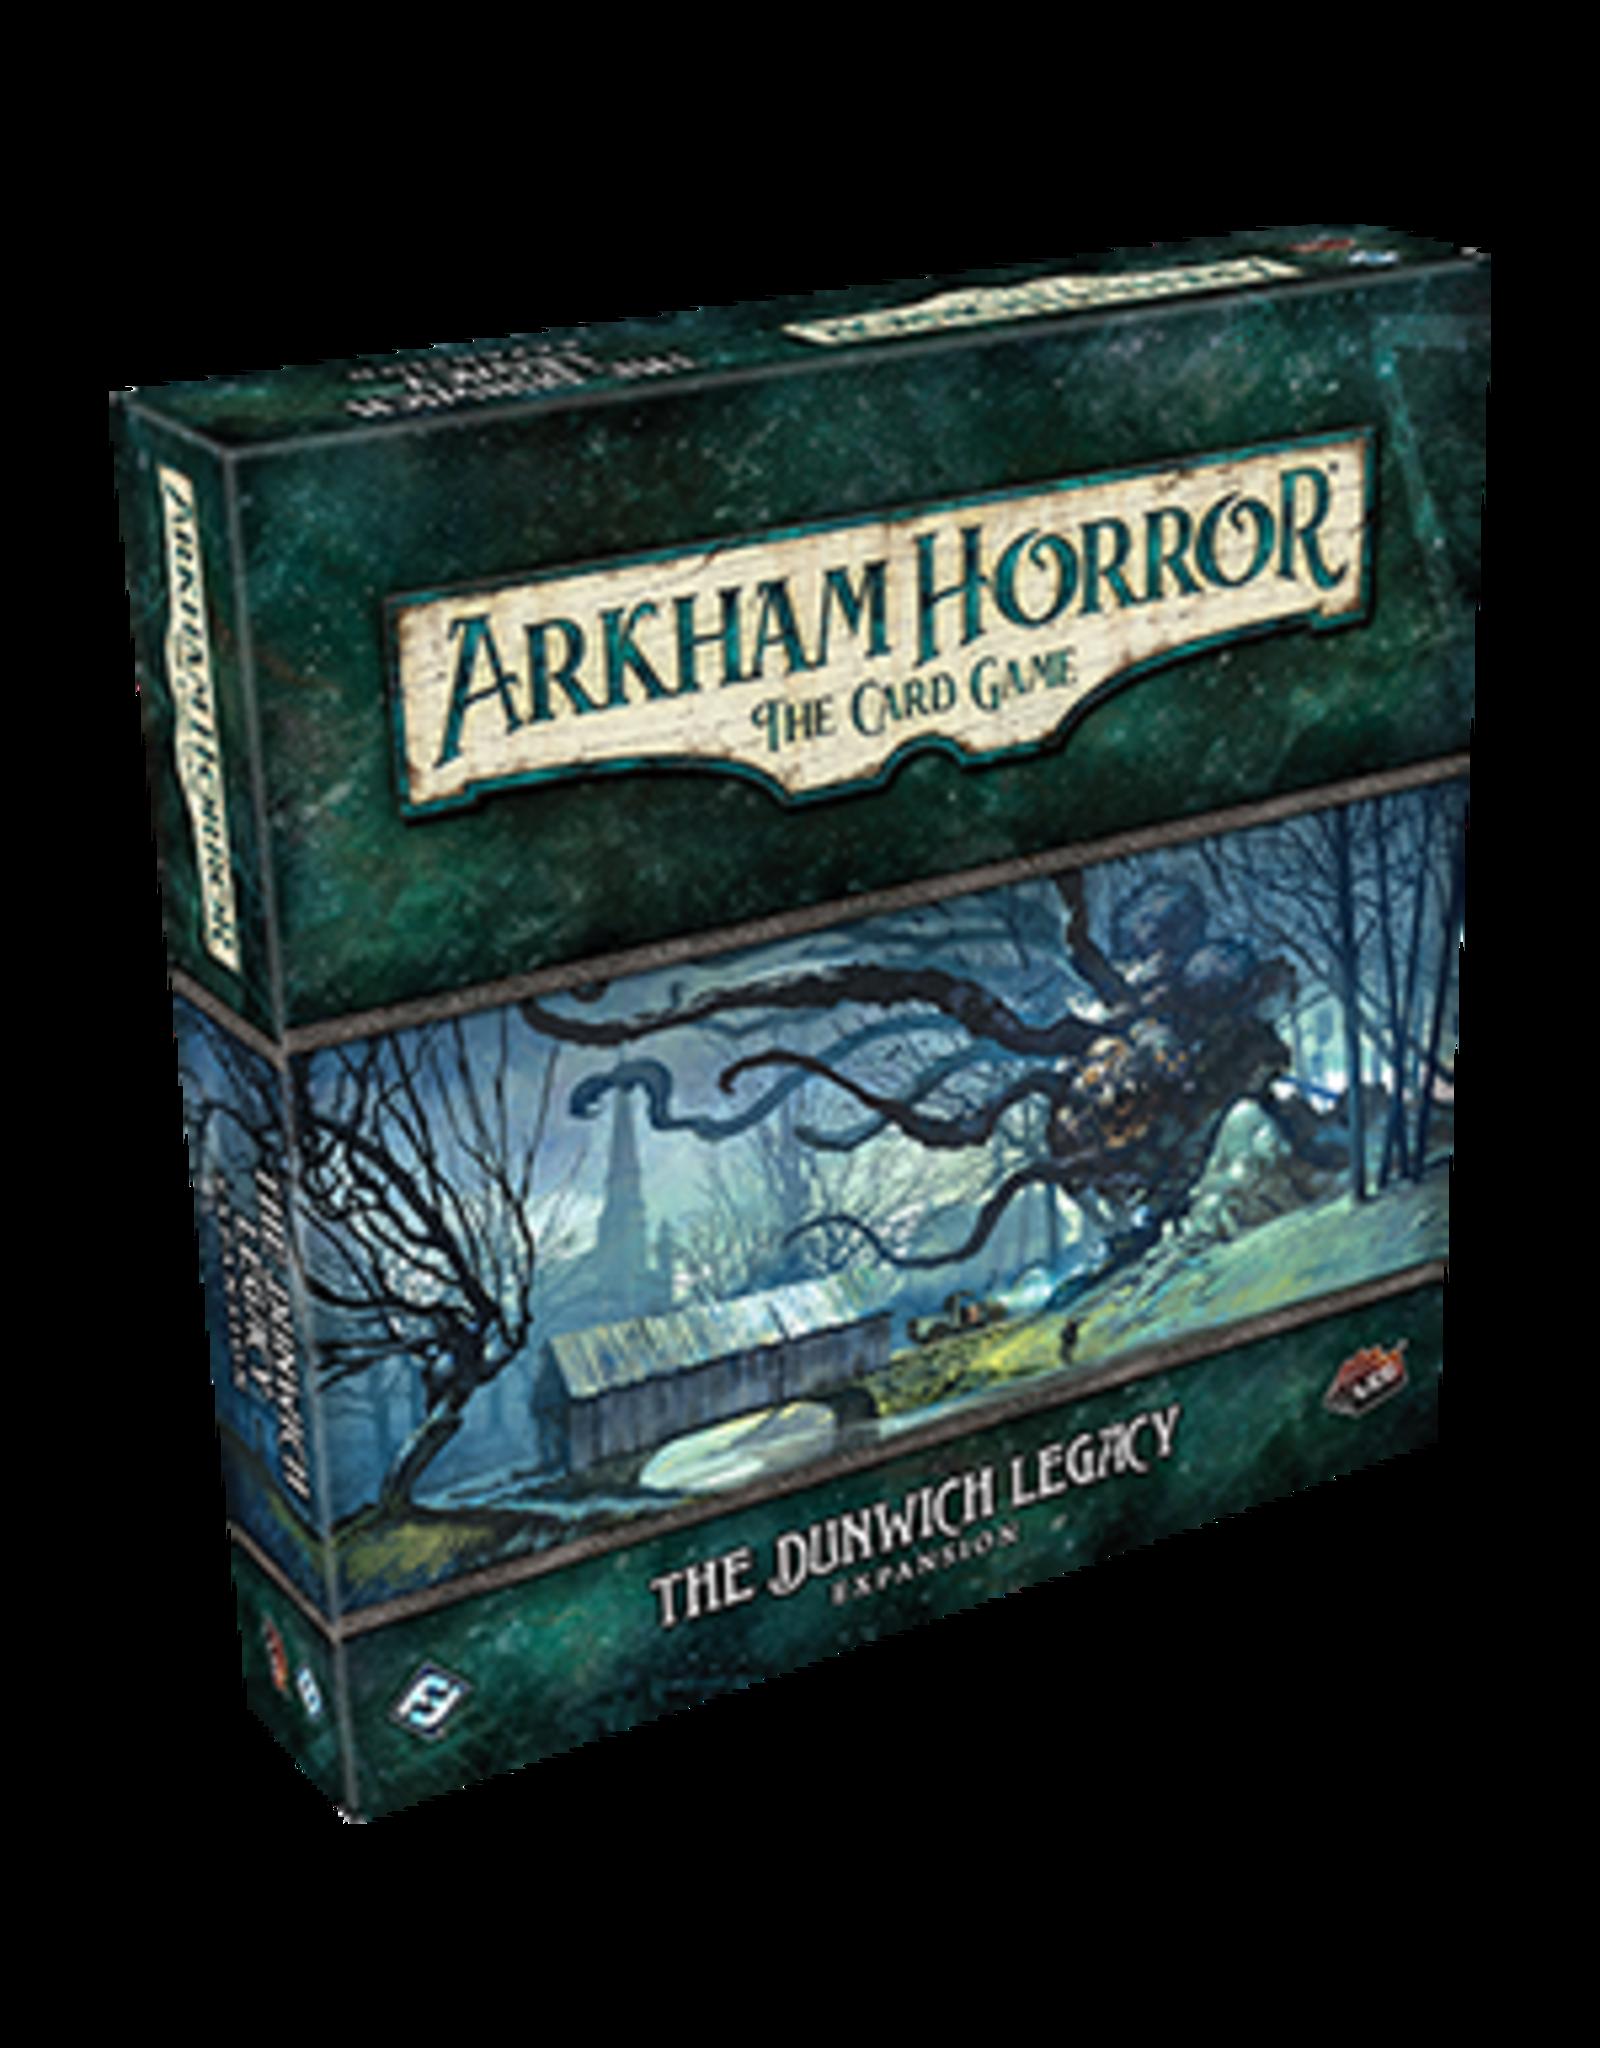 Fantasy Flight Games Arkham Horror LCG Dunwich Legacy Expansion